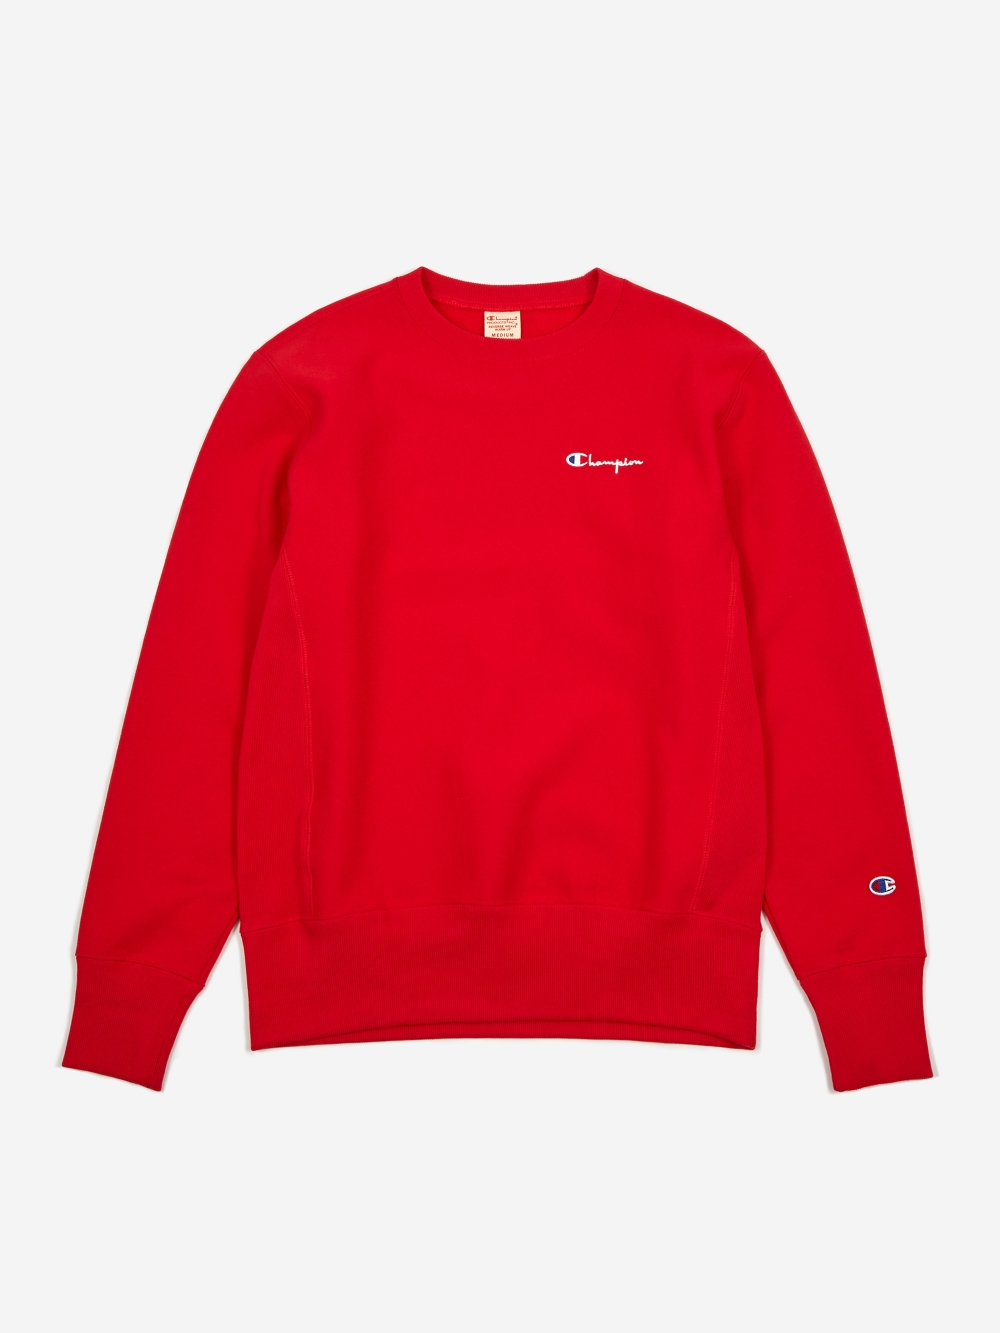 Champion Reverse Weave Small Script Crewneck Sweatshirt Red Red Champion Sweatshirt Crew Neck Sweatshirt Champion Clothing [ 1333 x 1000 Pixel ]